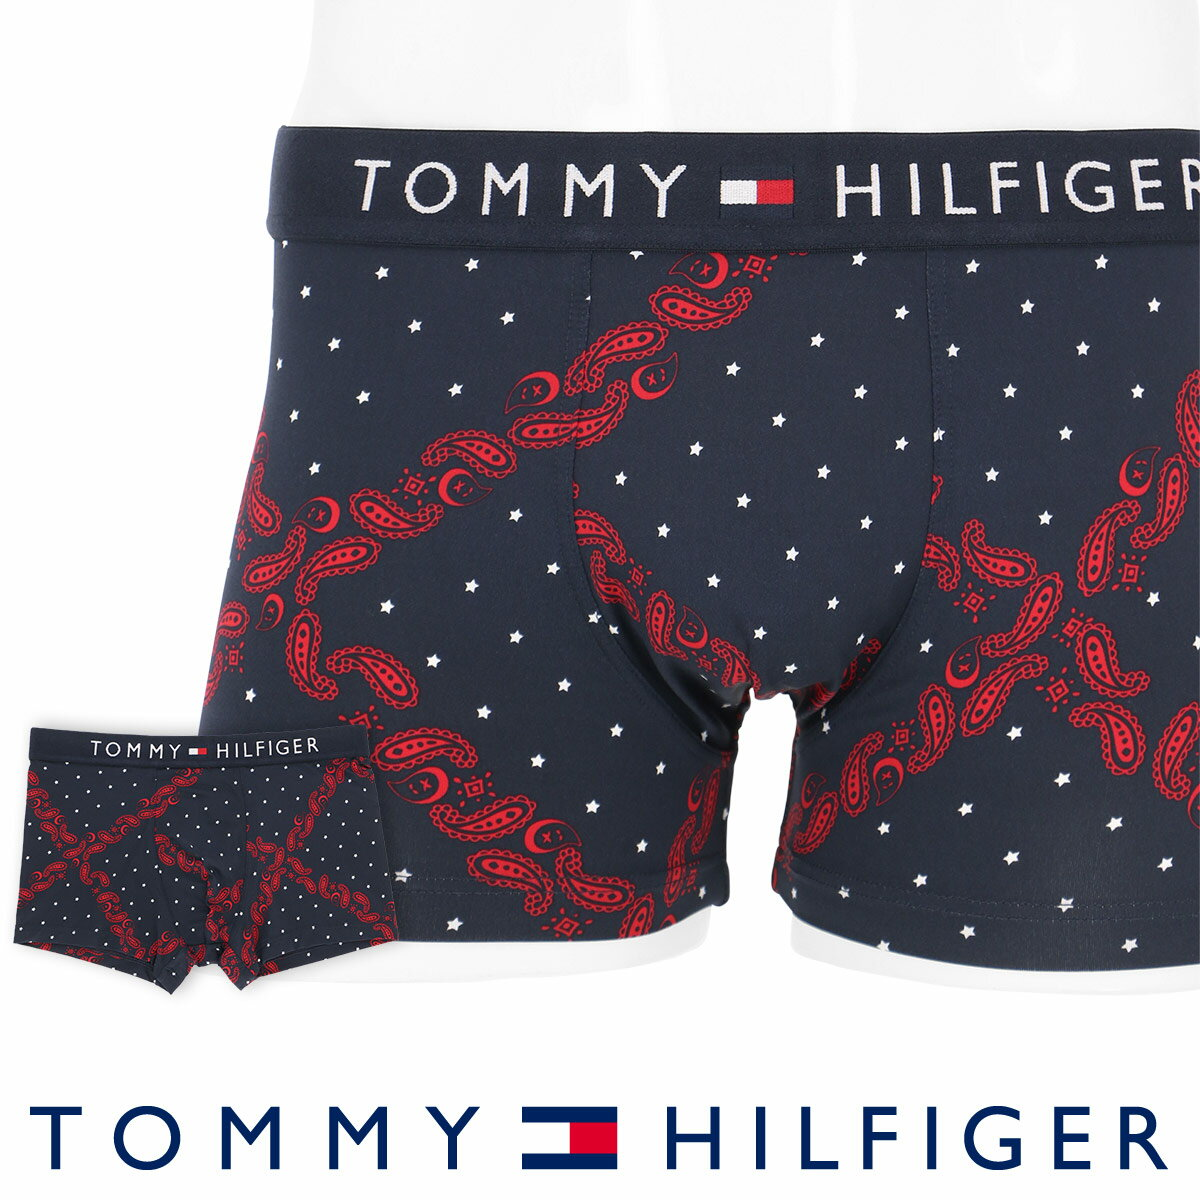 TOMMY HILFIGER FASHON UNDERWEAR MICRO&TENCEL PAISLEY CHECK 5339-1492